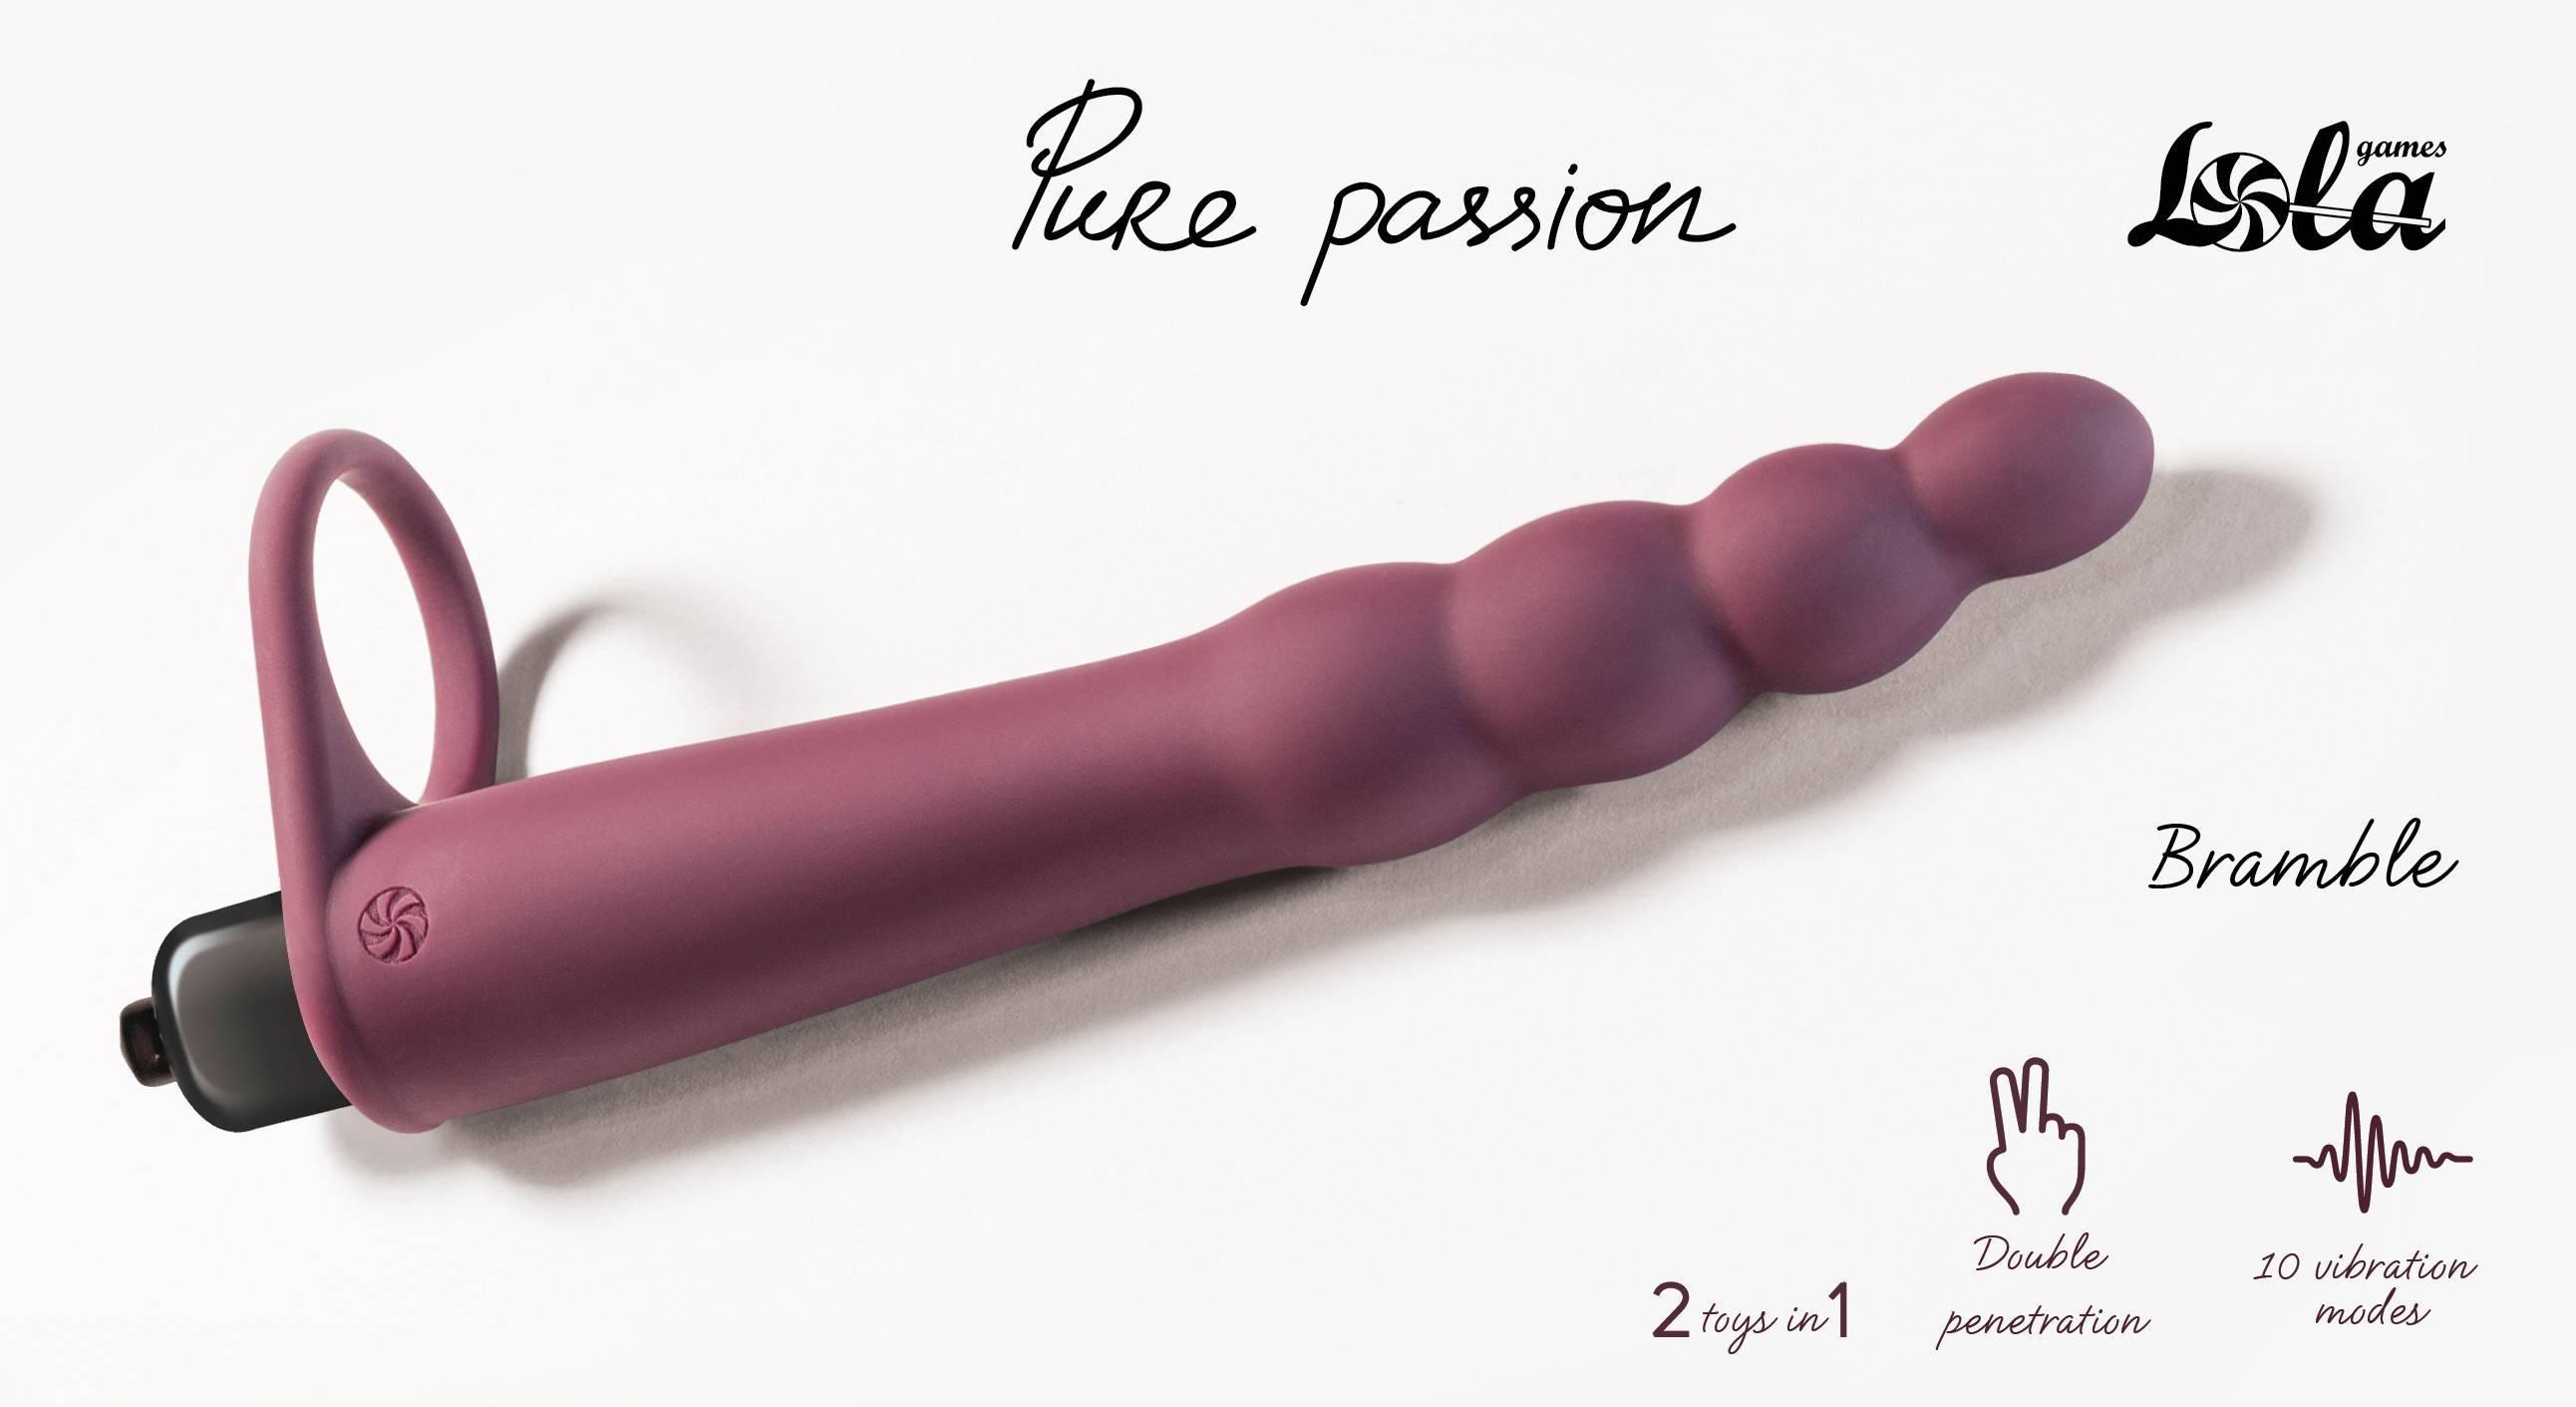 Вибронасадка для двойного проникновения Pure Passion Bramble Wine red 1201-02lola Бордовый Lola Games Pure Passion